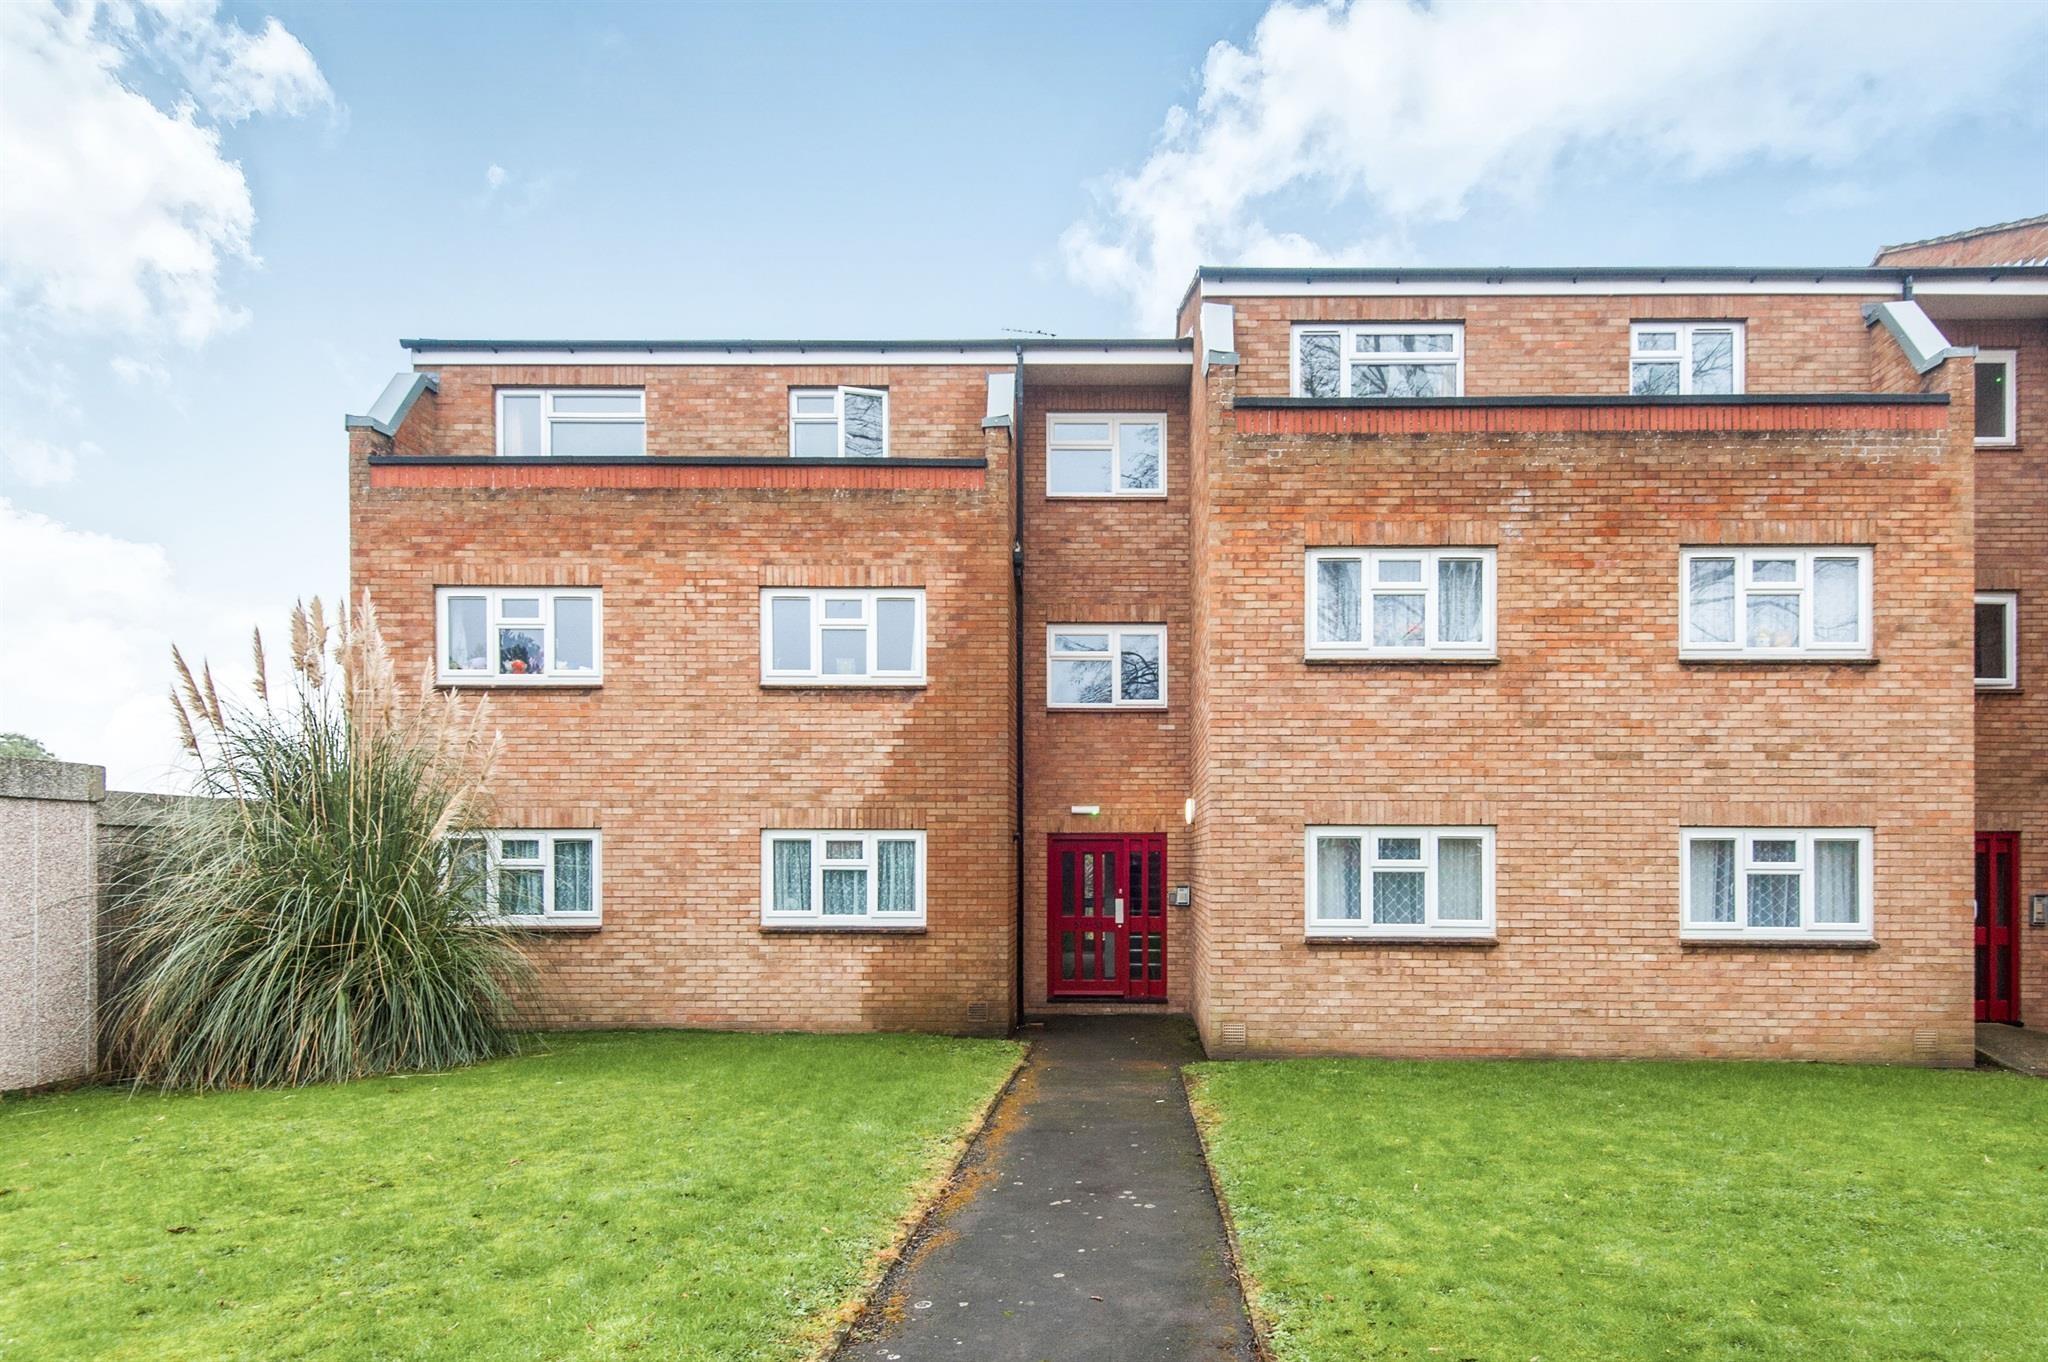 2 Bedroom Apartment For Sale Gladstone Street Taunton Ta2 6ly